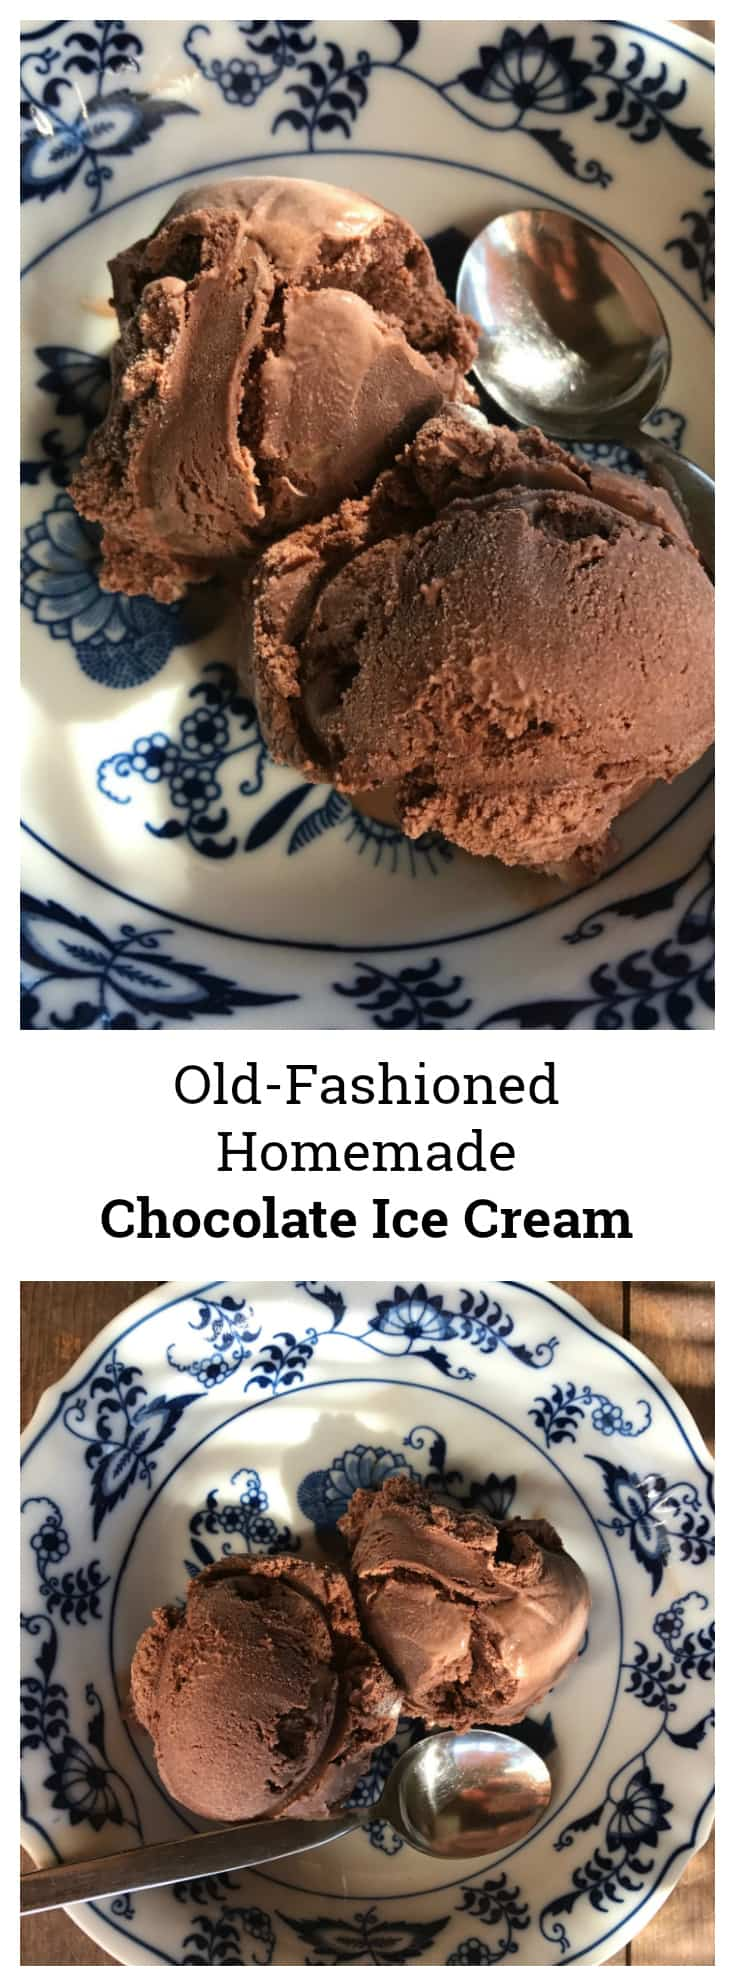 Old-Fashioned Homemade Chocolate Ice Cream